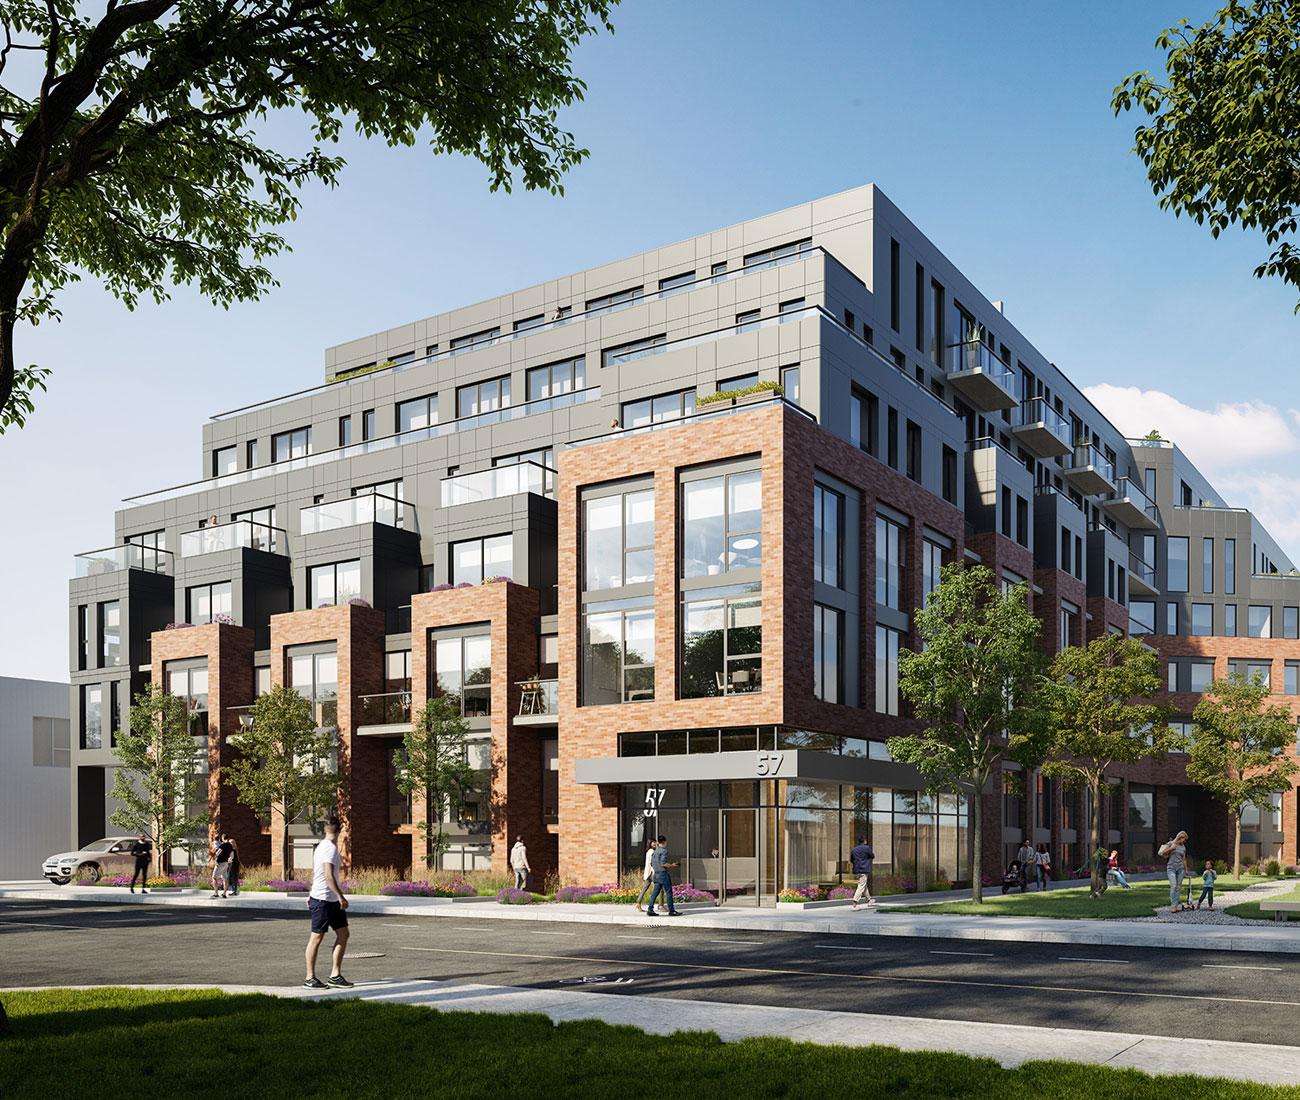 Apts Magazine: The Missing Mid-Rise Buildings Toronto Needs